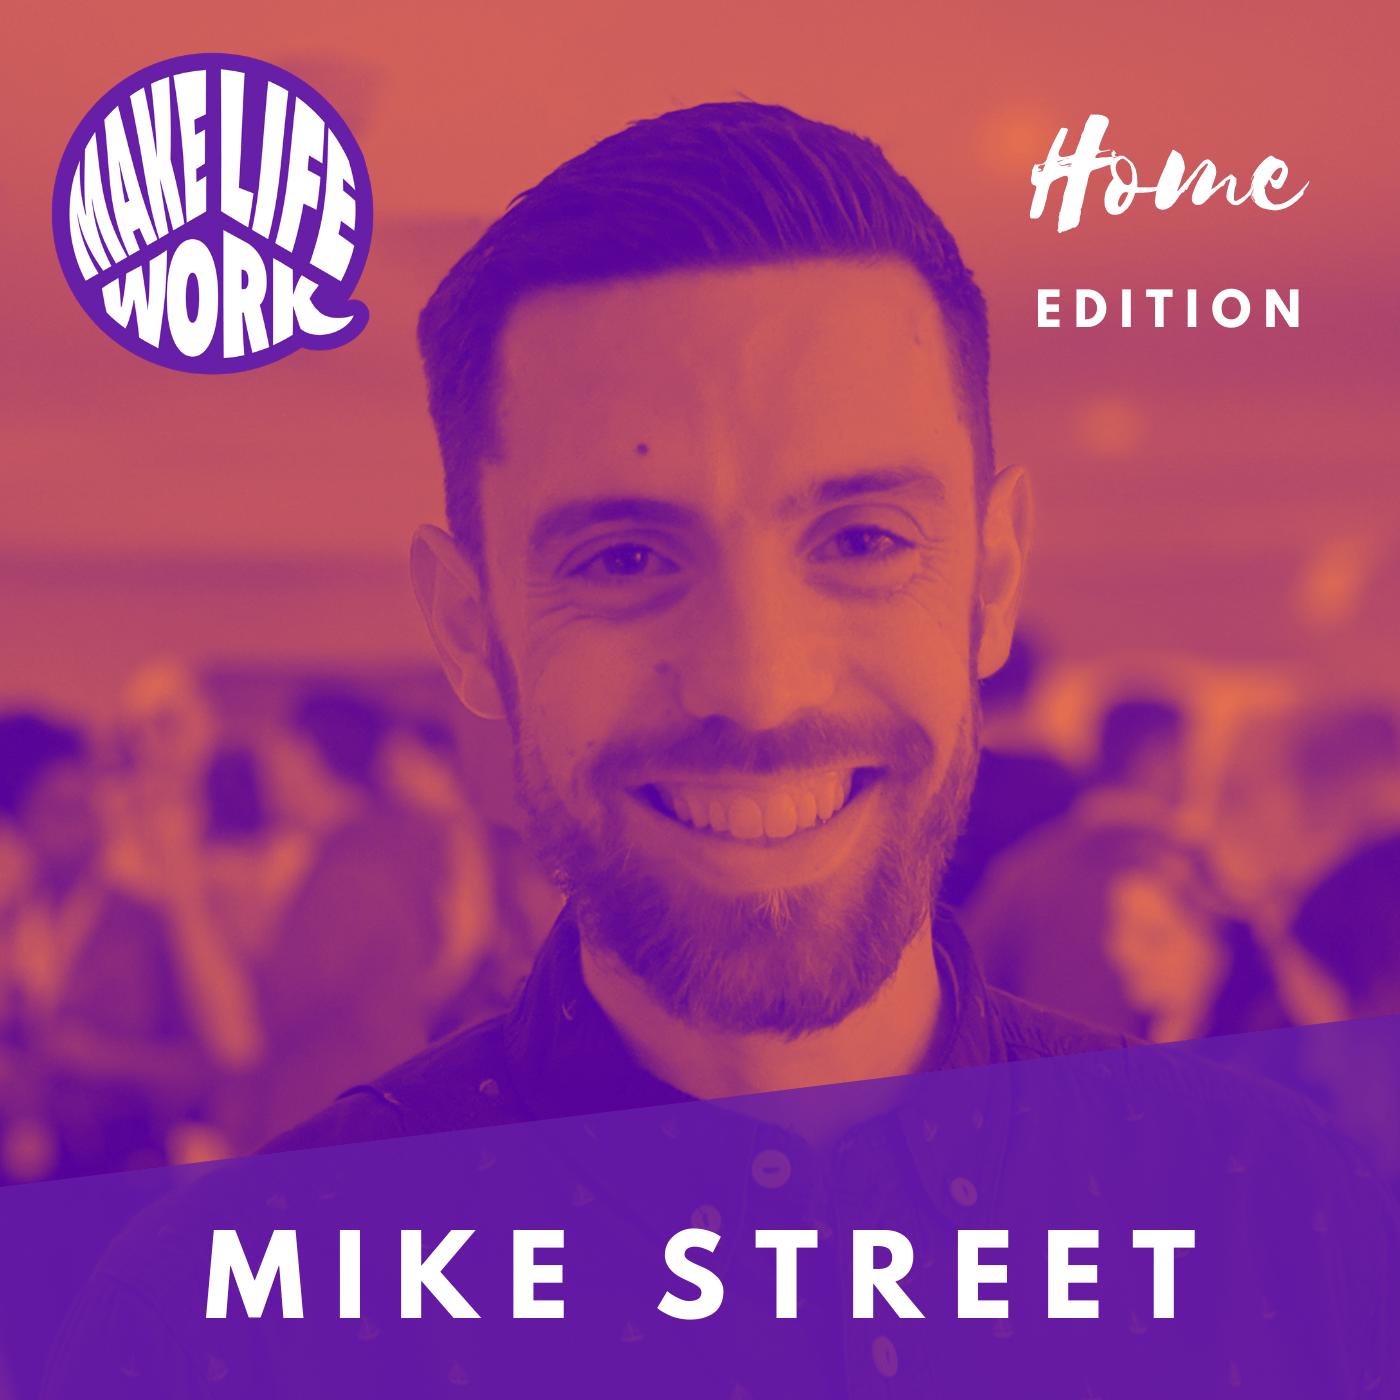 Make Life Work 15 - Mike Street